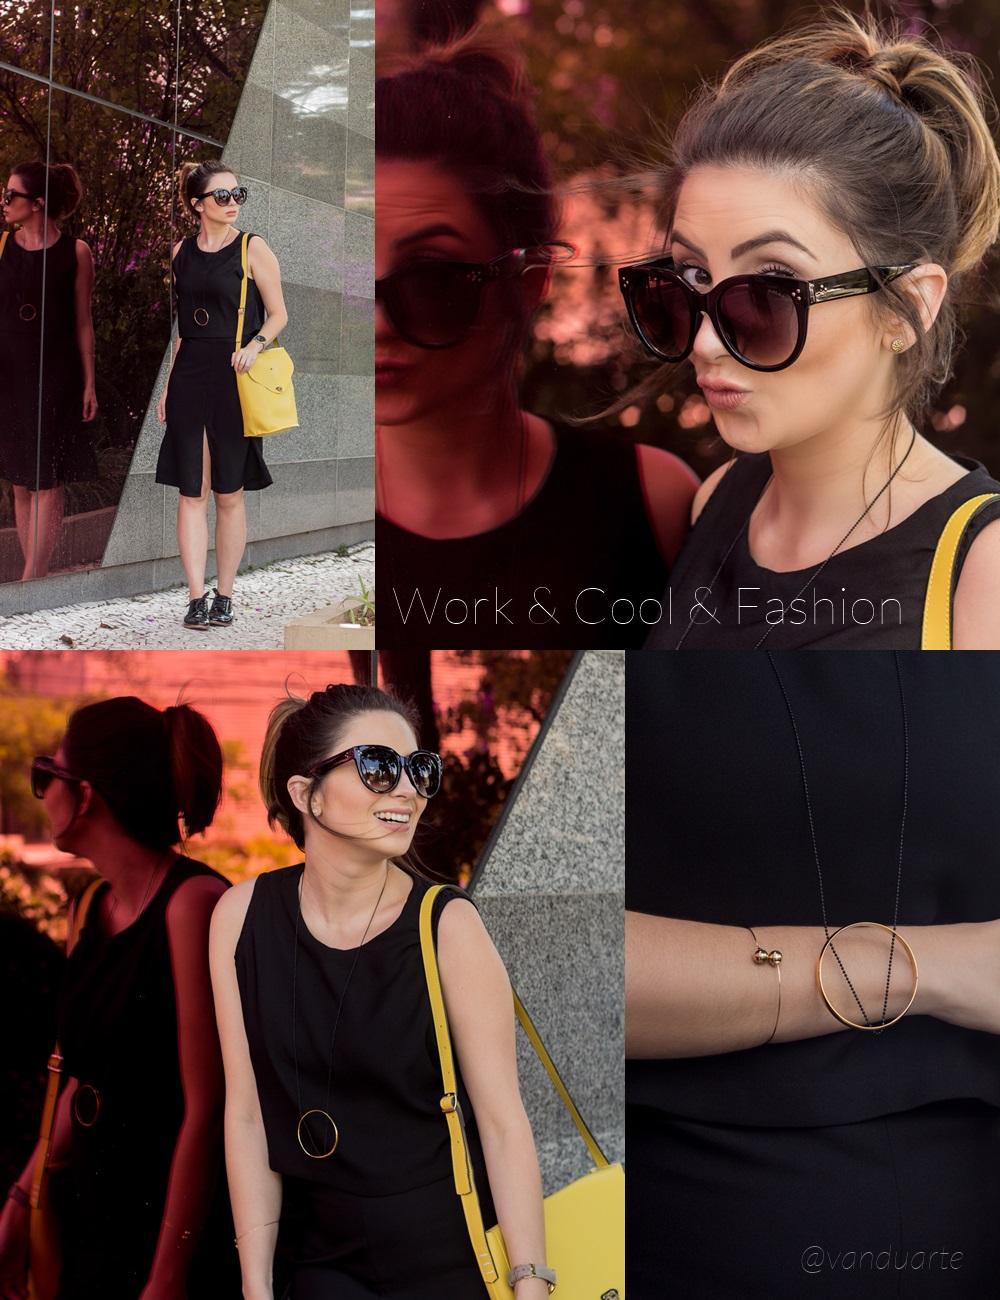 look-trababalho-vestido-preto-workwear-blog-vanduarte-2